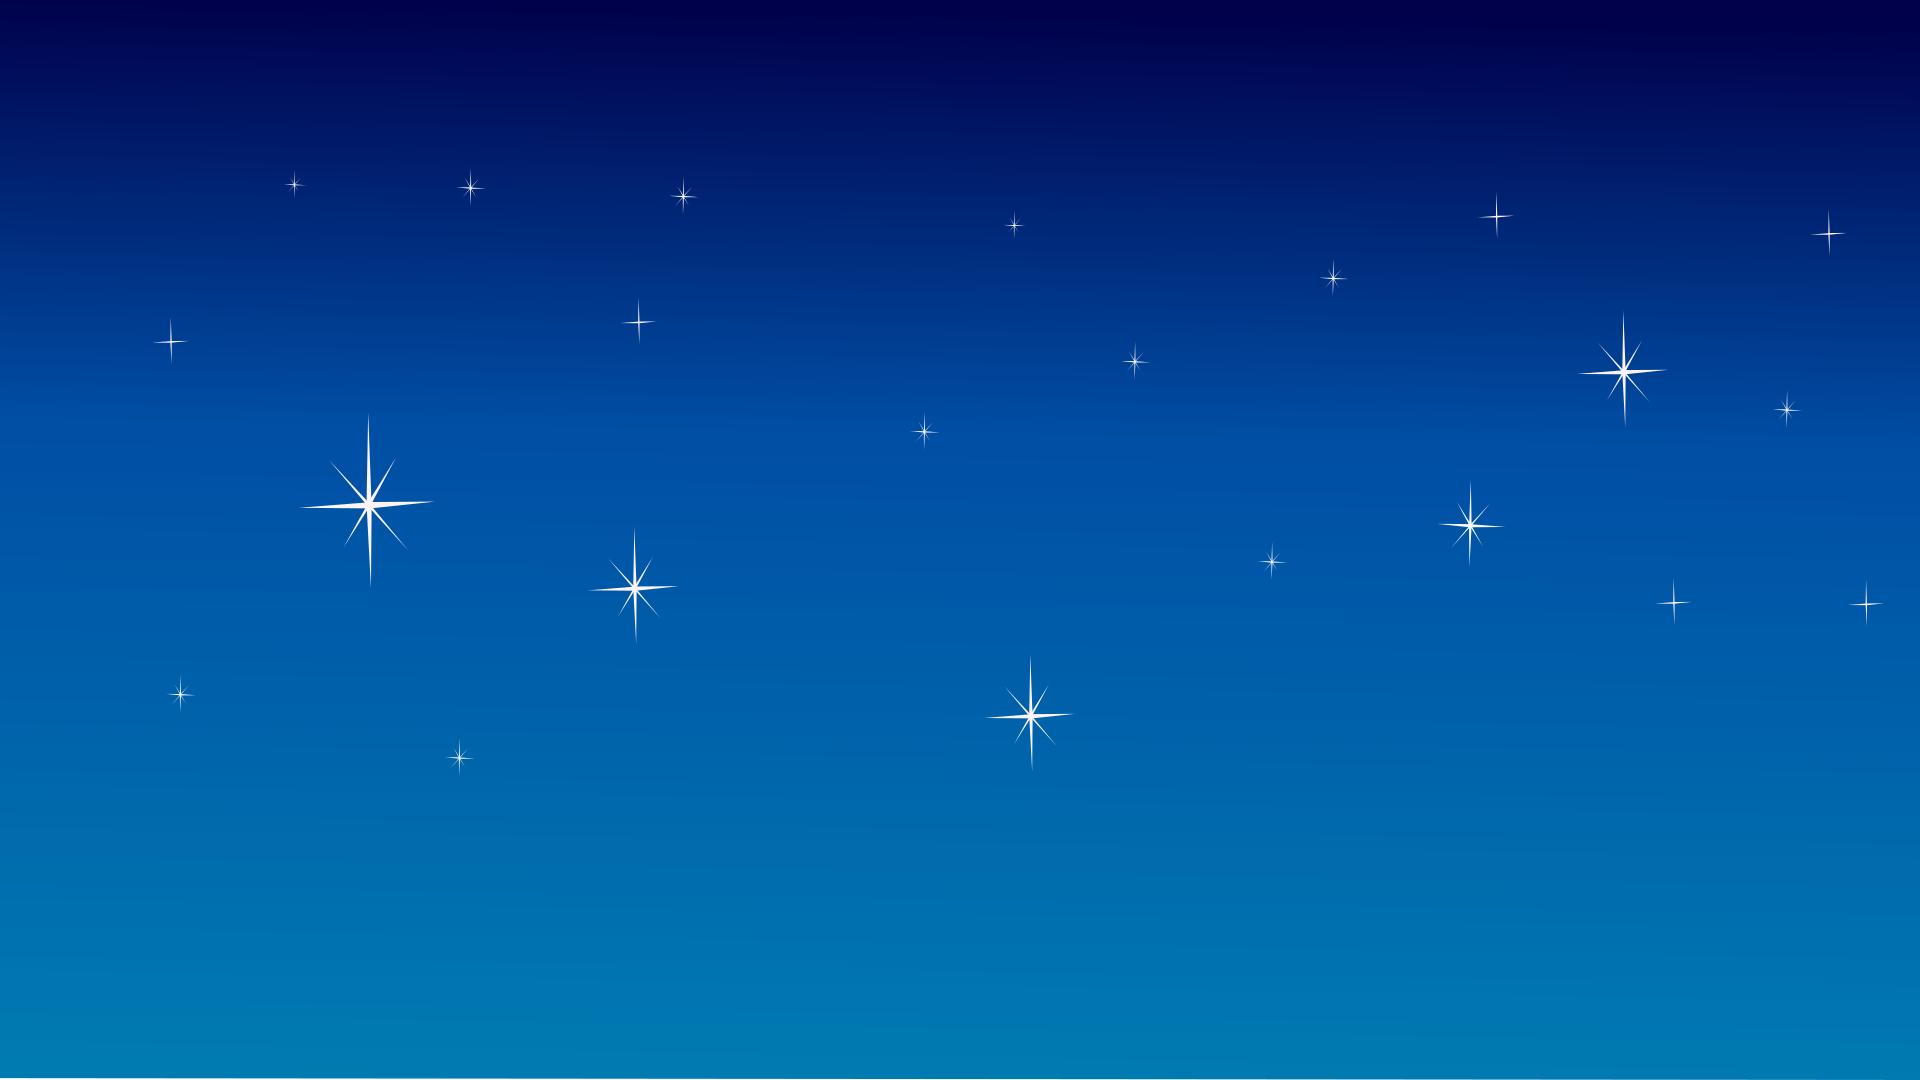 starry sky wallpaper.